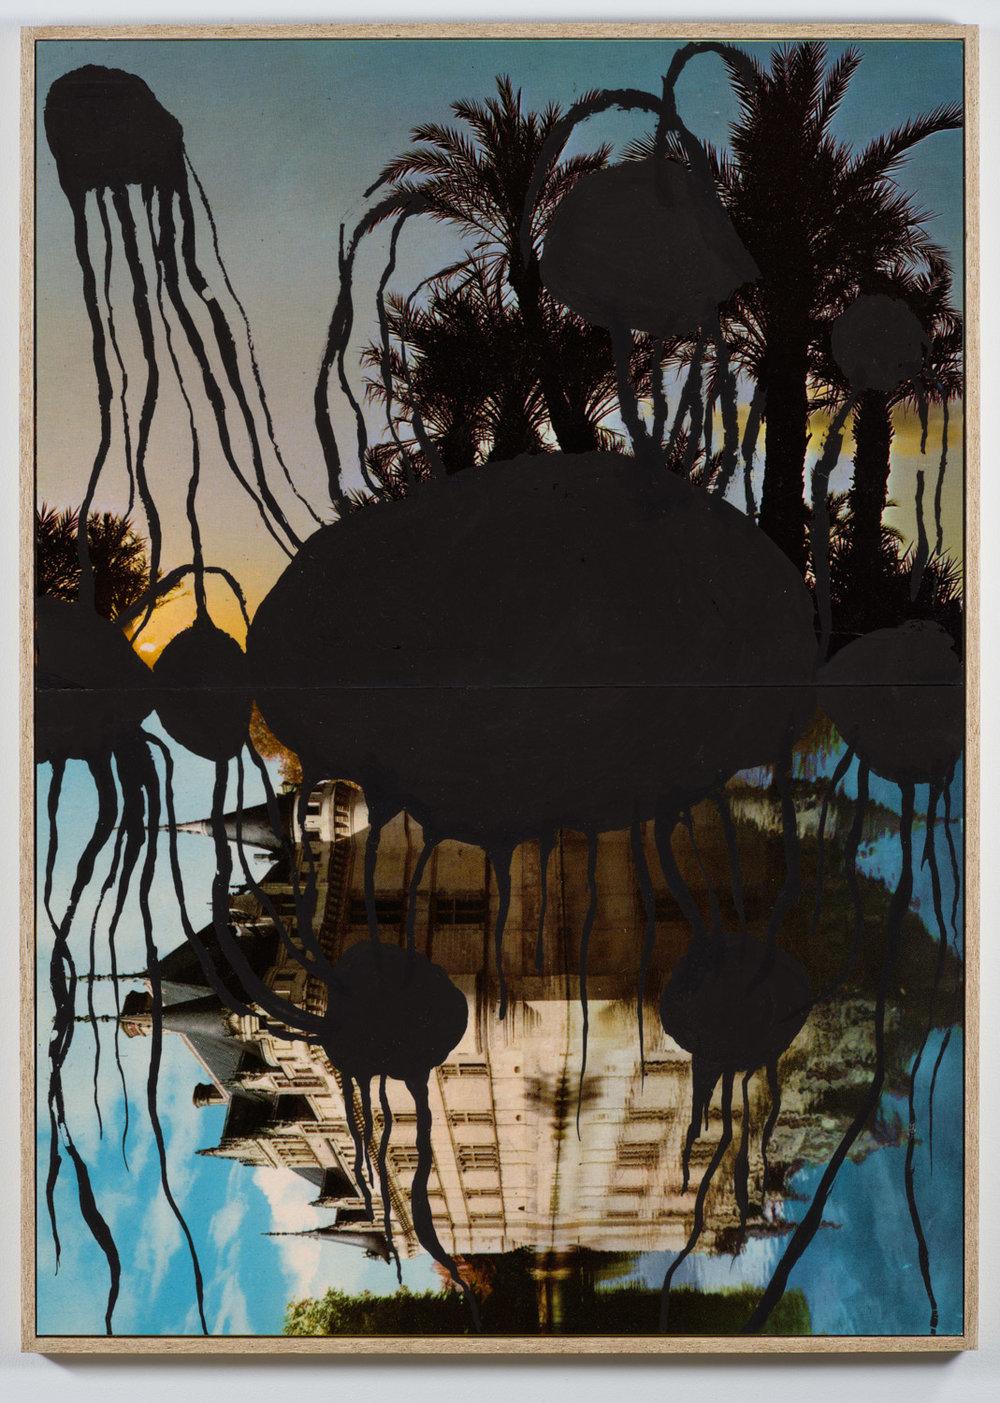 Pierre Ardouvin   Ecran de veille (Screensaver) , 2013 print on canvas, resin, glitter, chipboard framing  66 15/16 x 47 1/4 in(170 x 120 cm) PA13P6